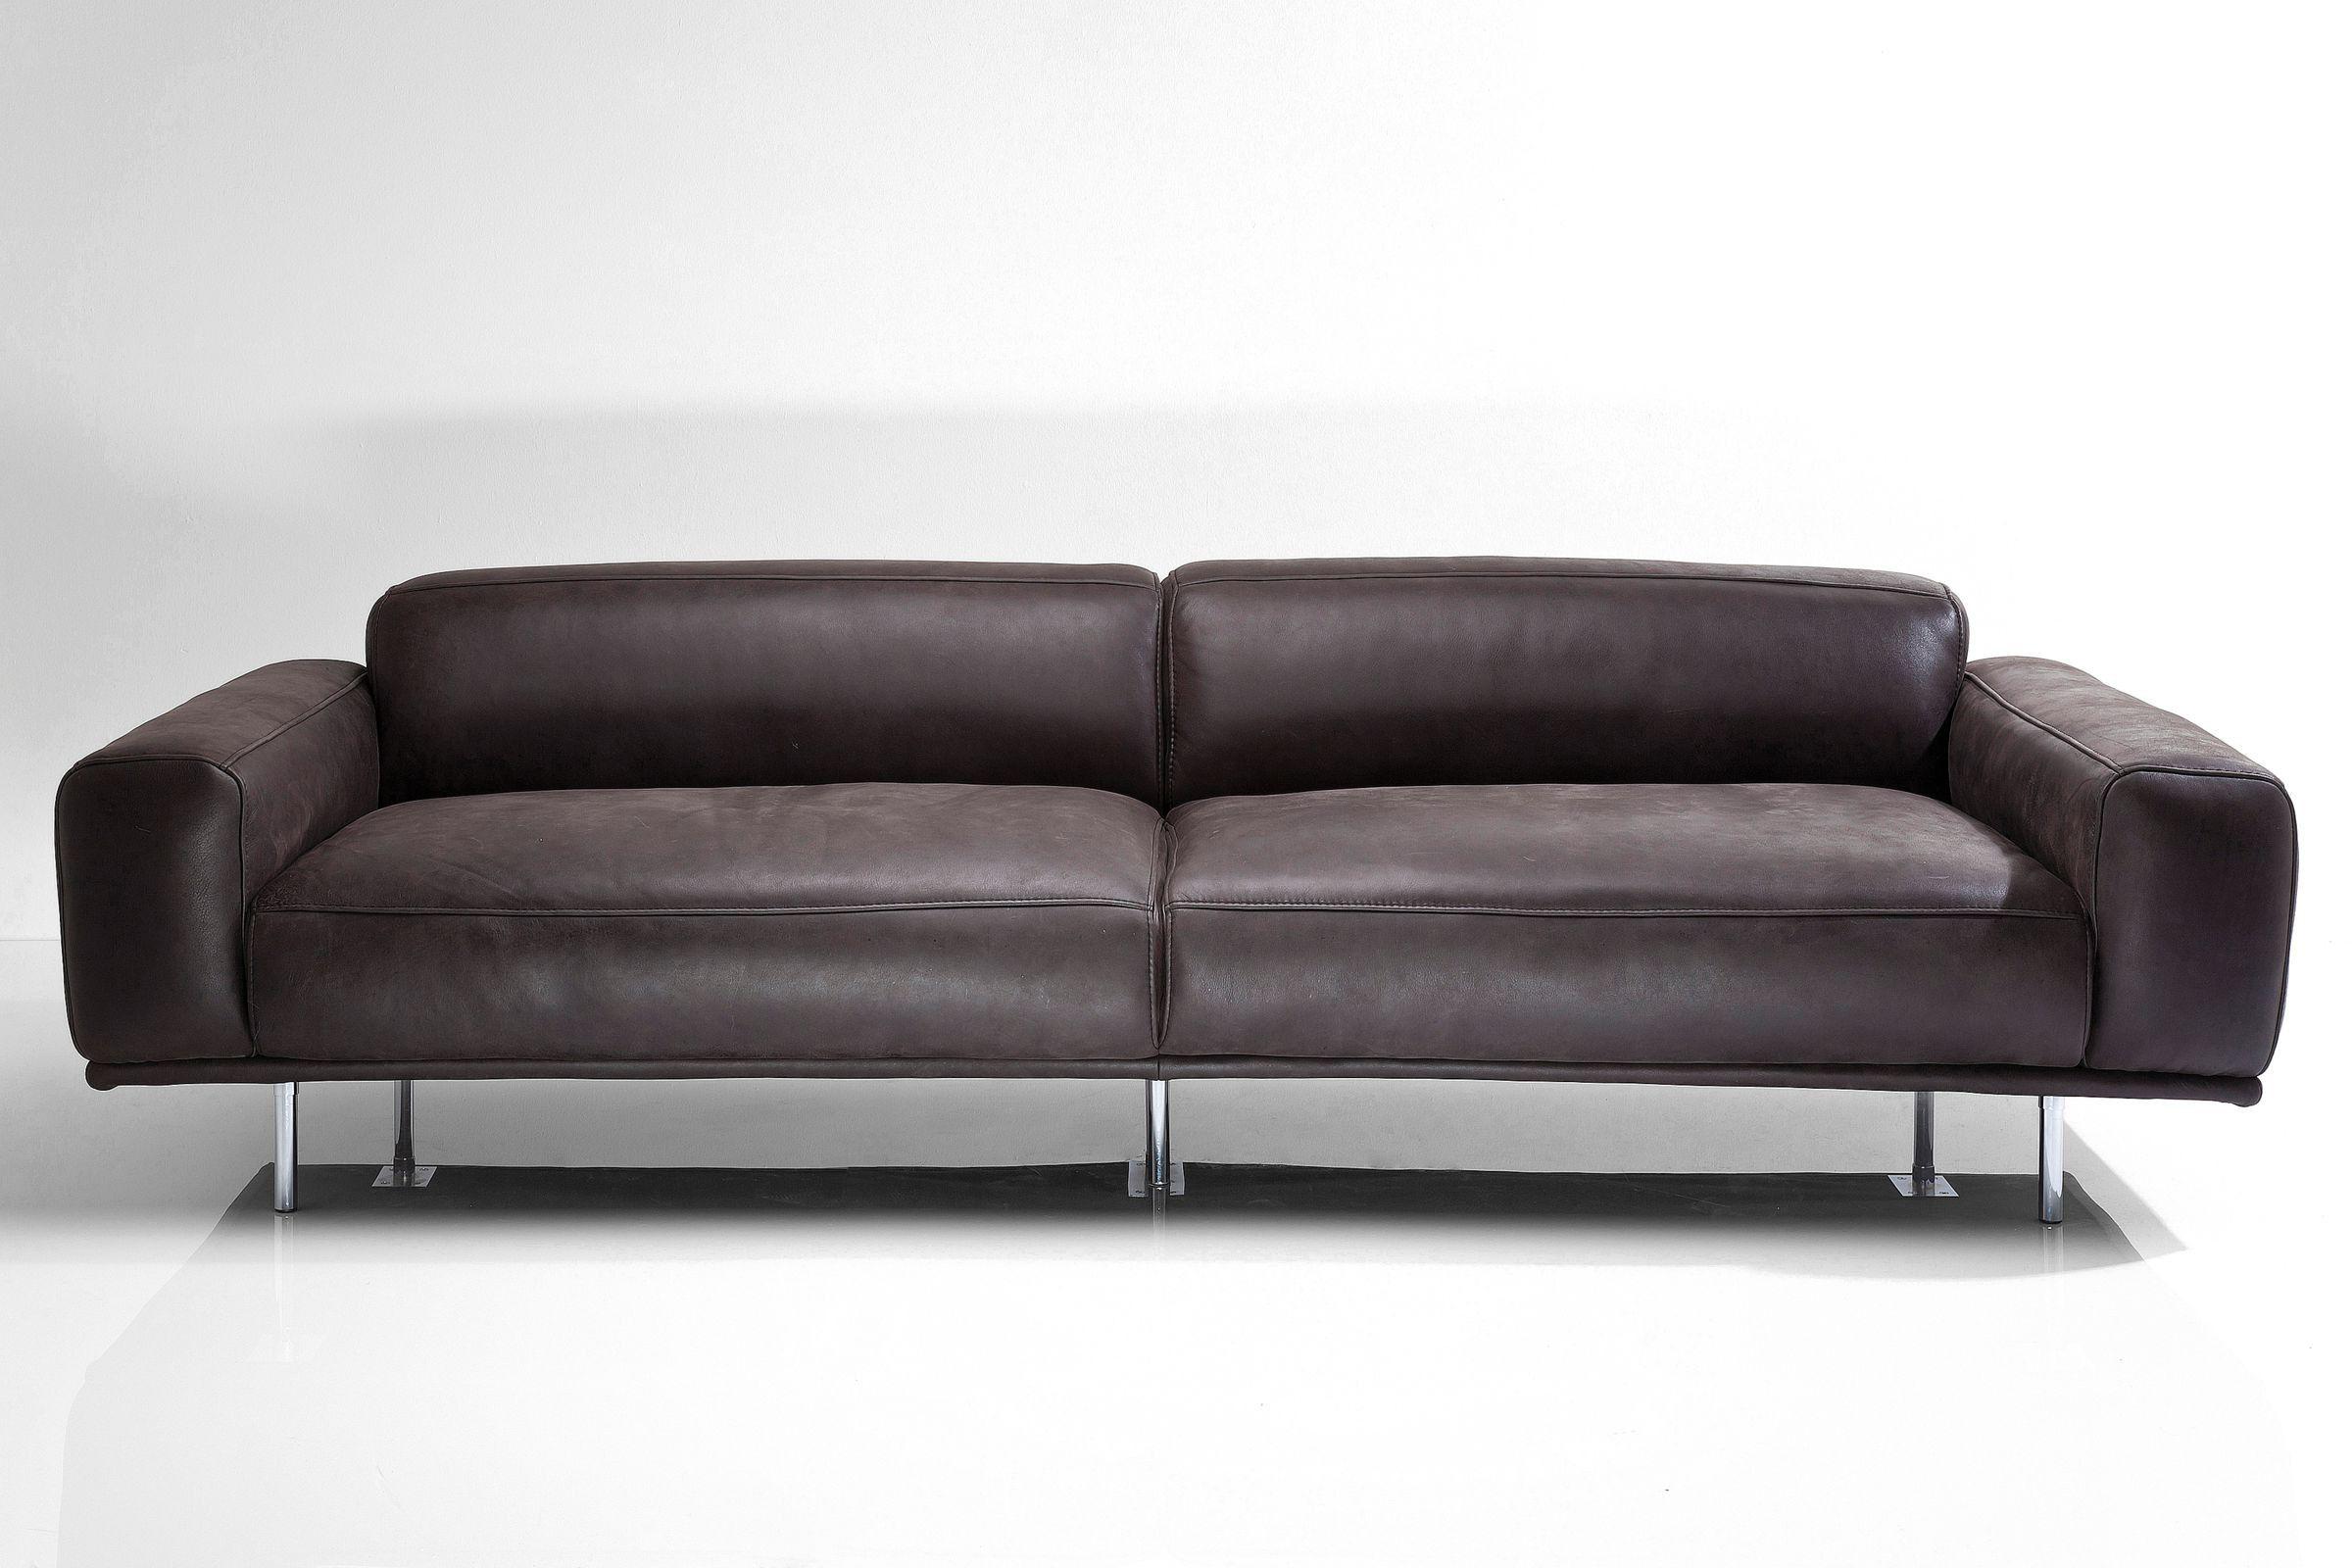 Sofa lorenzo 245cm leder anthrazit by kare design studio for Made divani